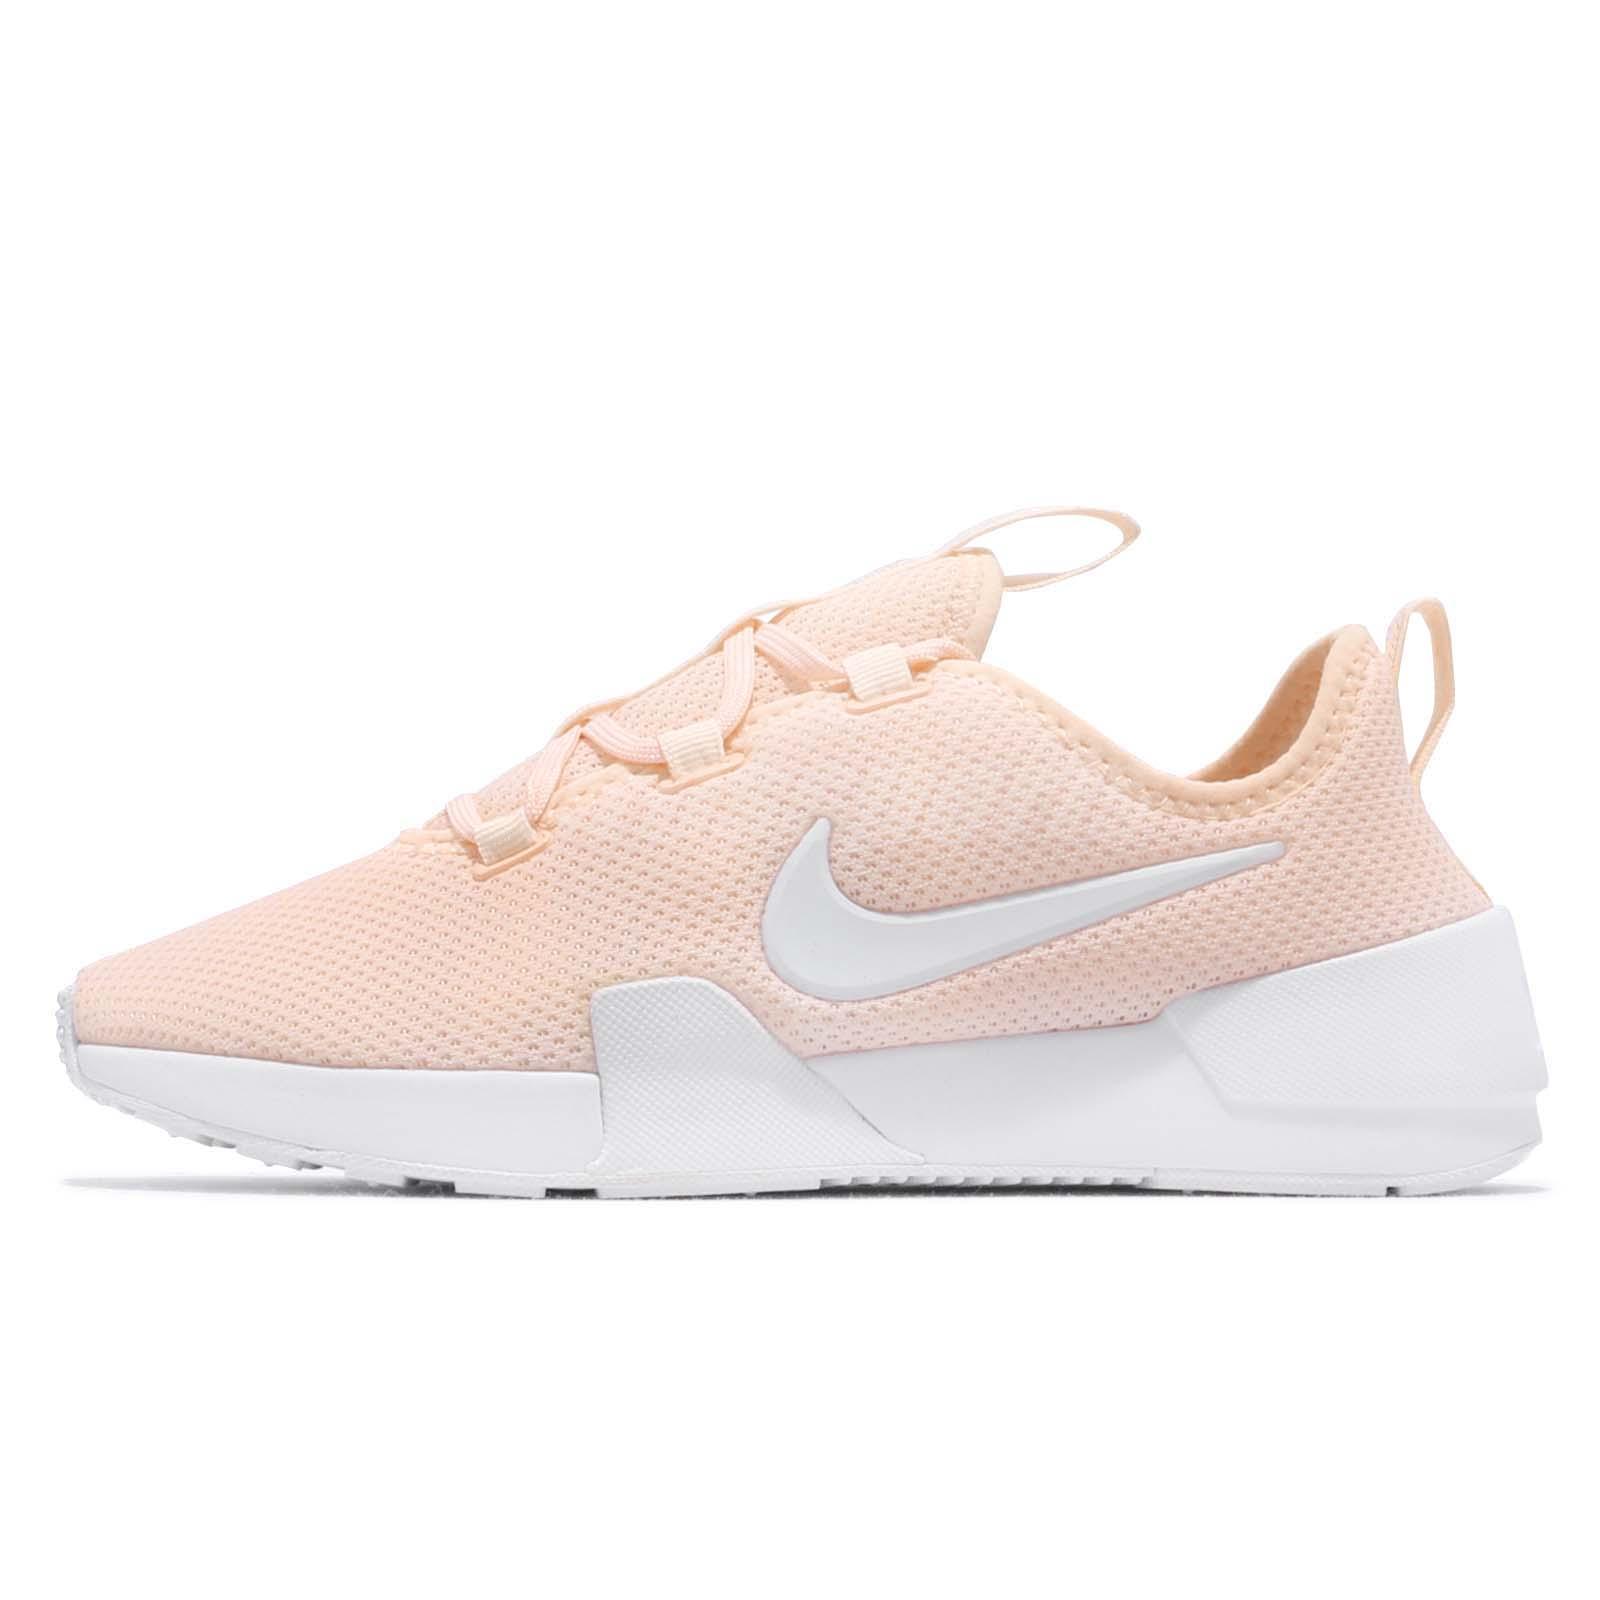 446ba3f373ac8 Nike Wmns Ashin Modern Guava Ice White Women Running Casual Shoes AJ8799-800